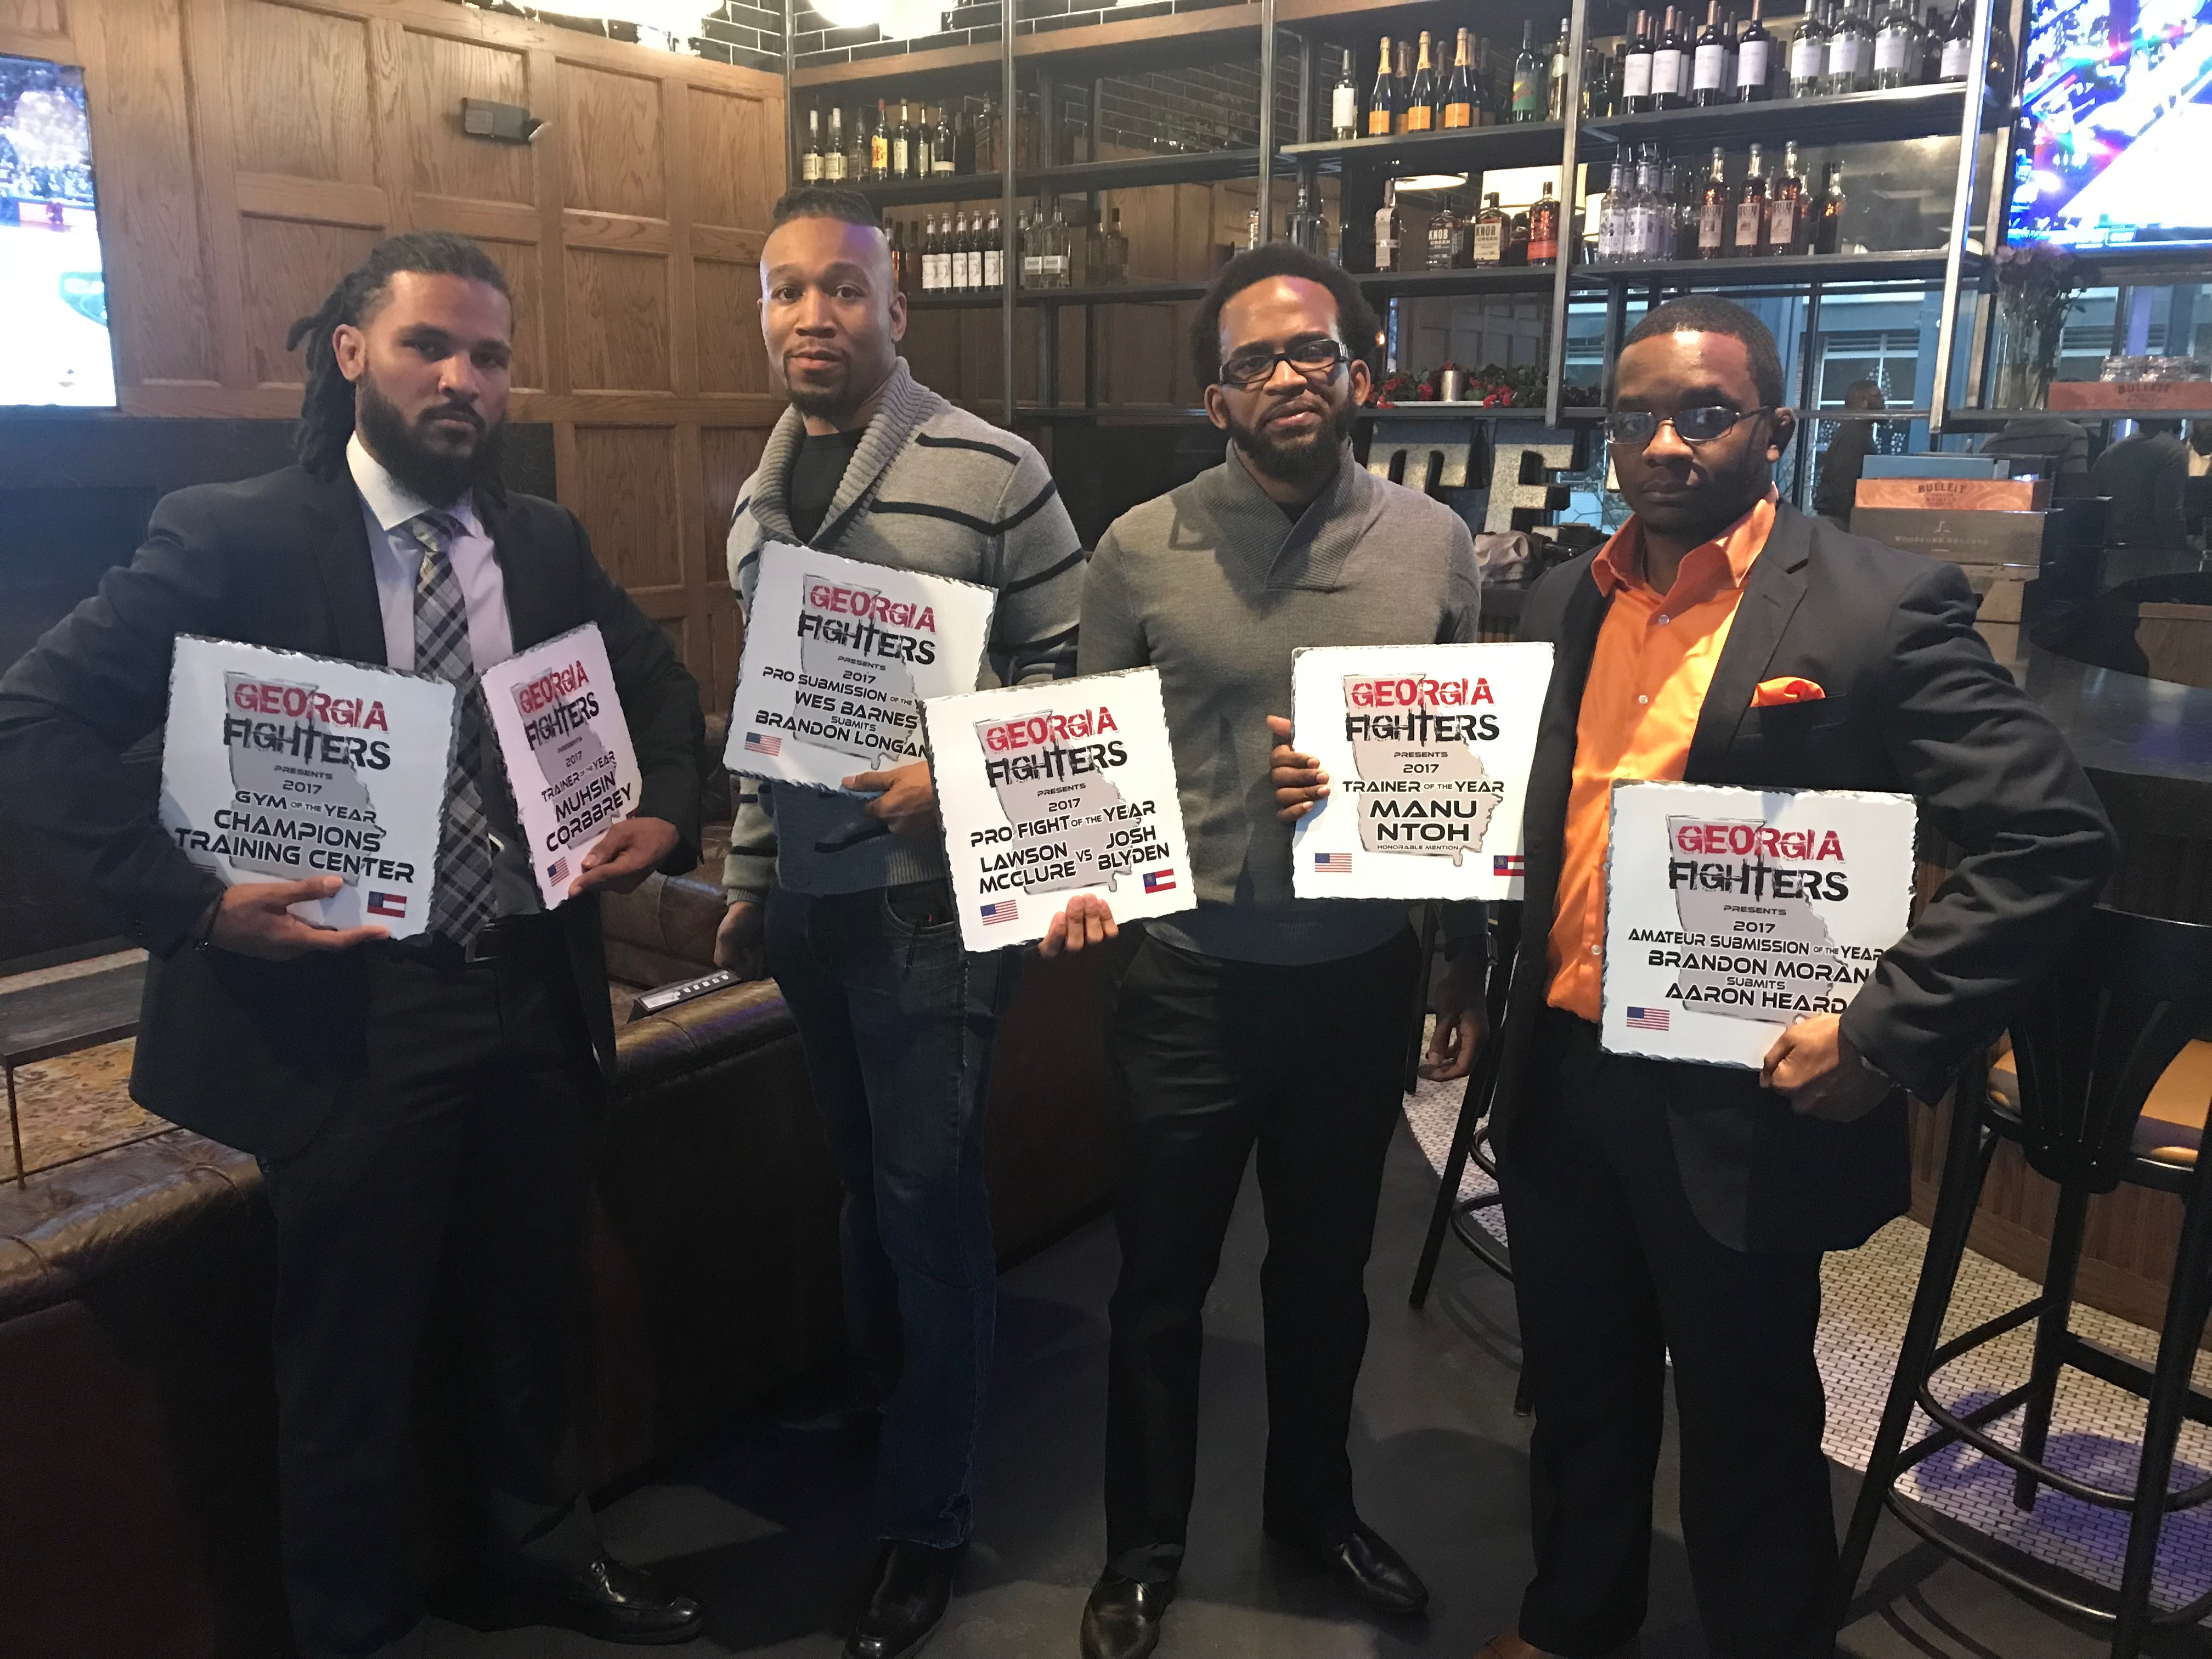 Georgia Fighter Awards